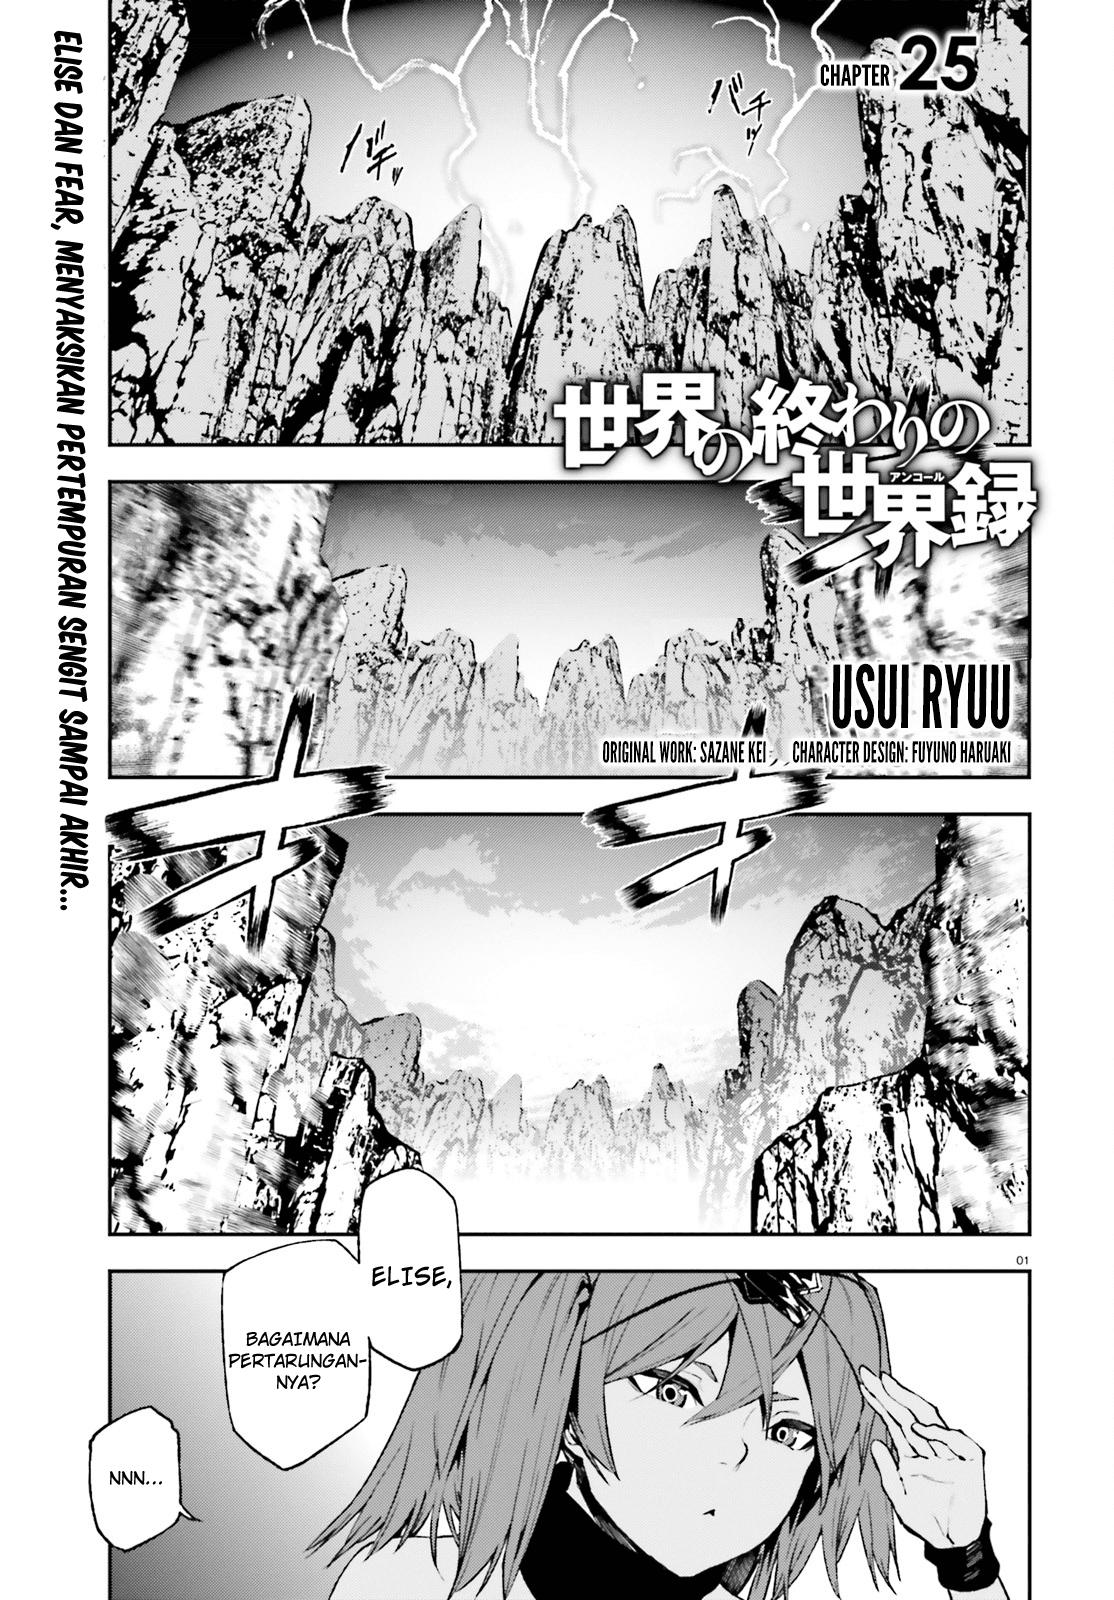 Baca Komik Sekai no Owari no Encore Chapter 25 Bahasa Indonesia Page 3 Kintamaindo